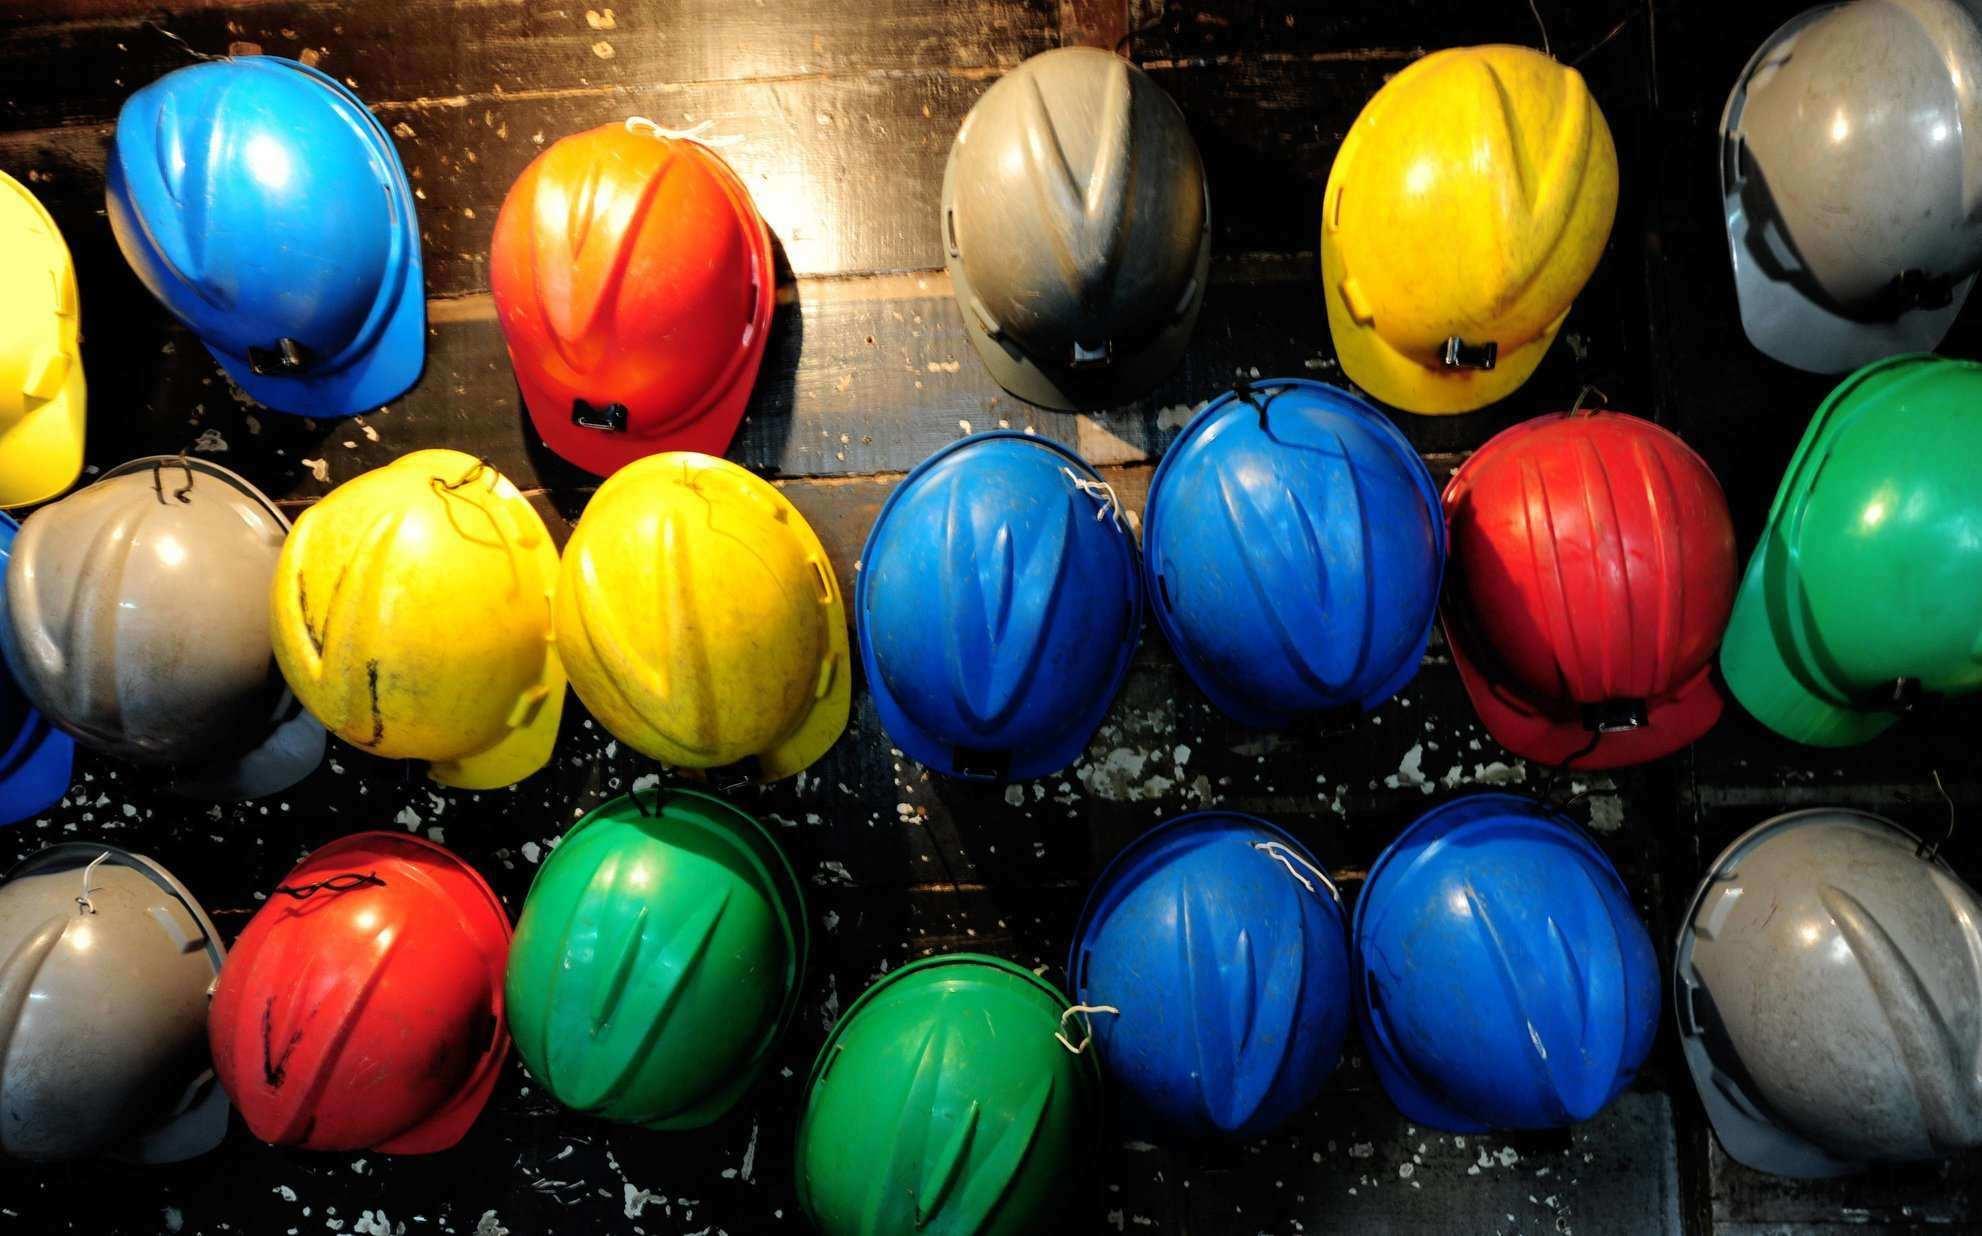 Codelco, Enami advance on Ecuador copper project